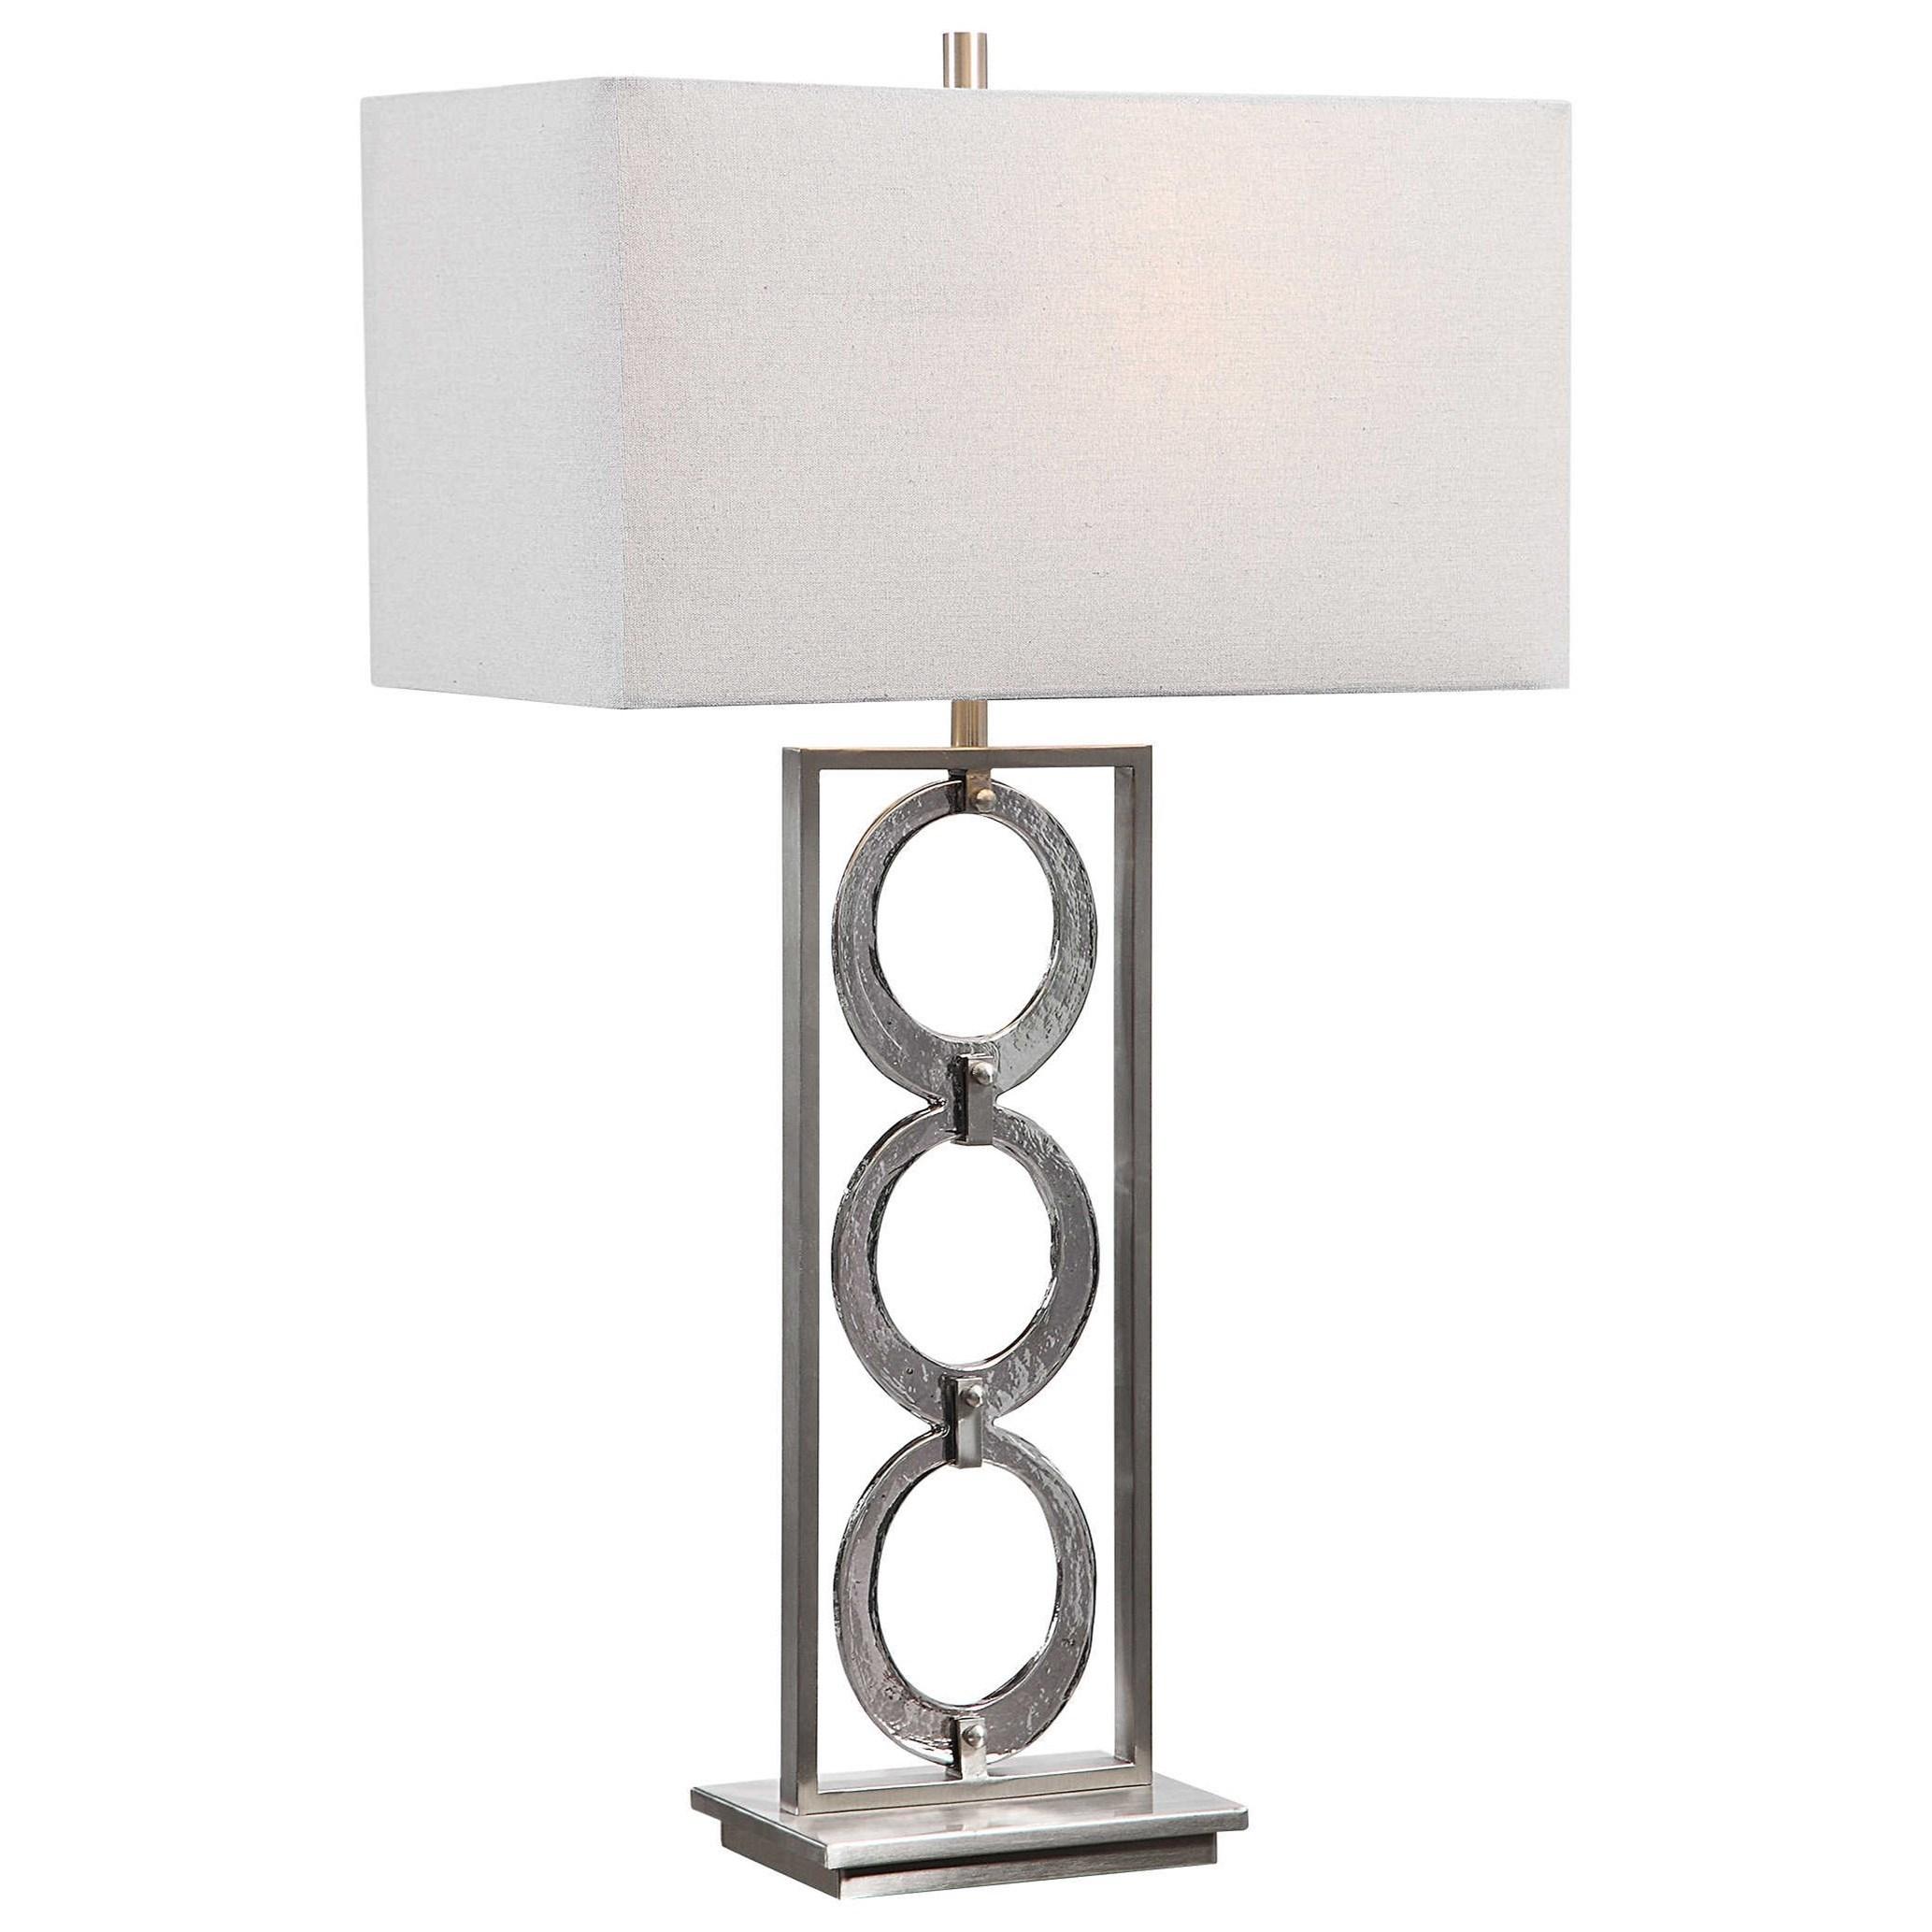 Perrin Nickel Table Lamp